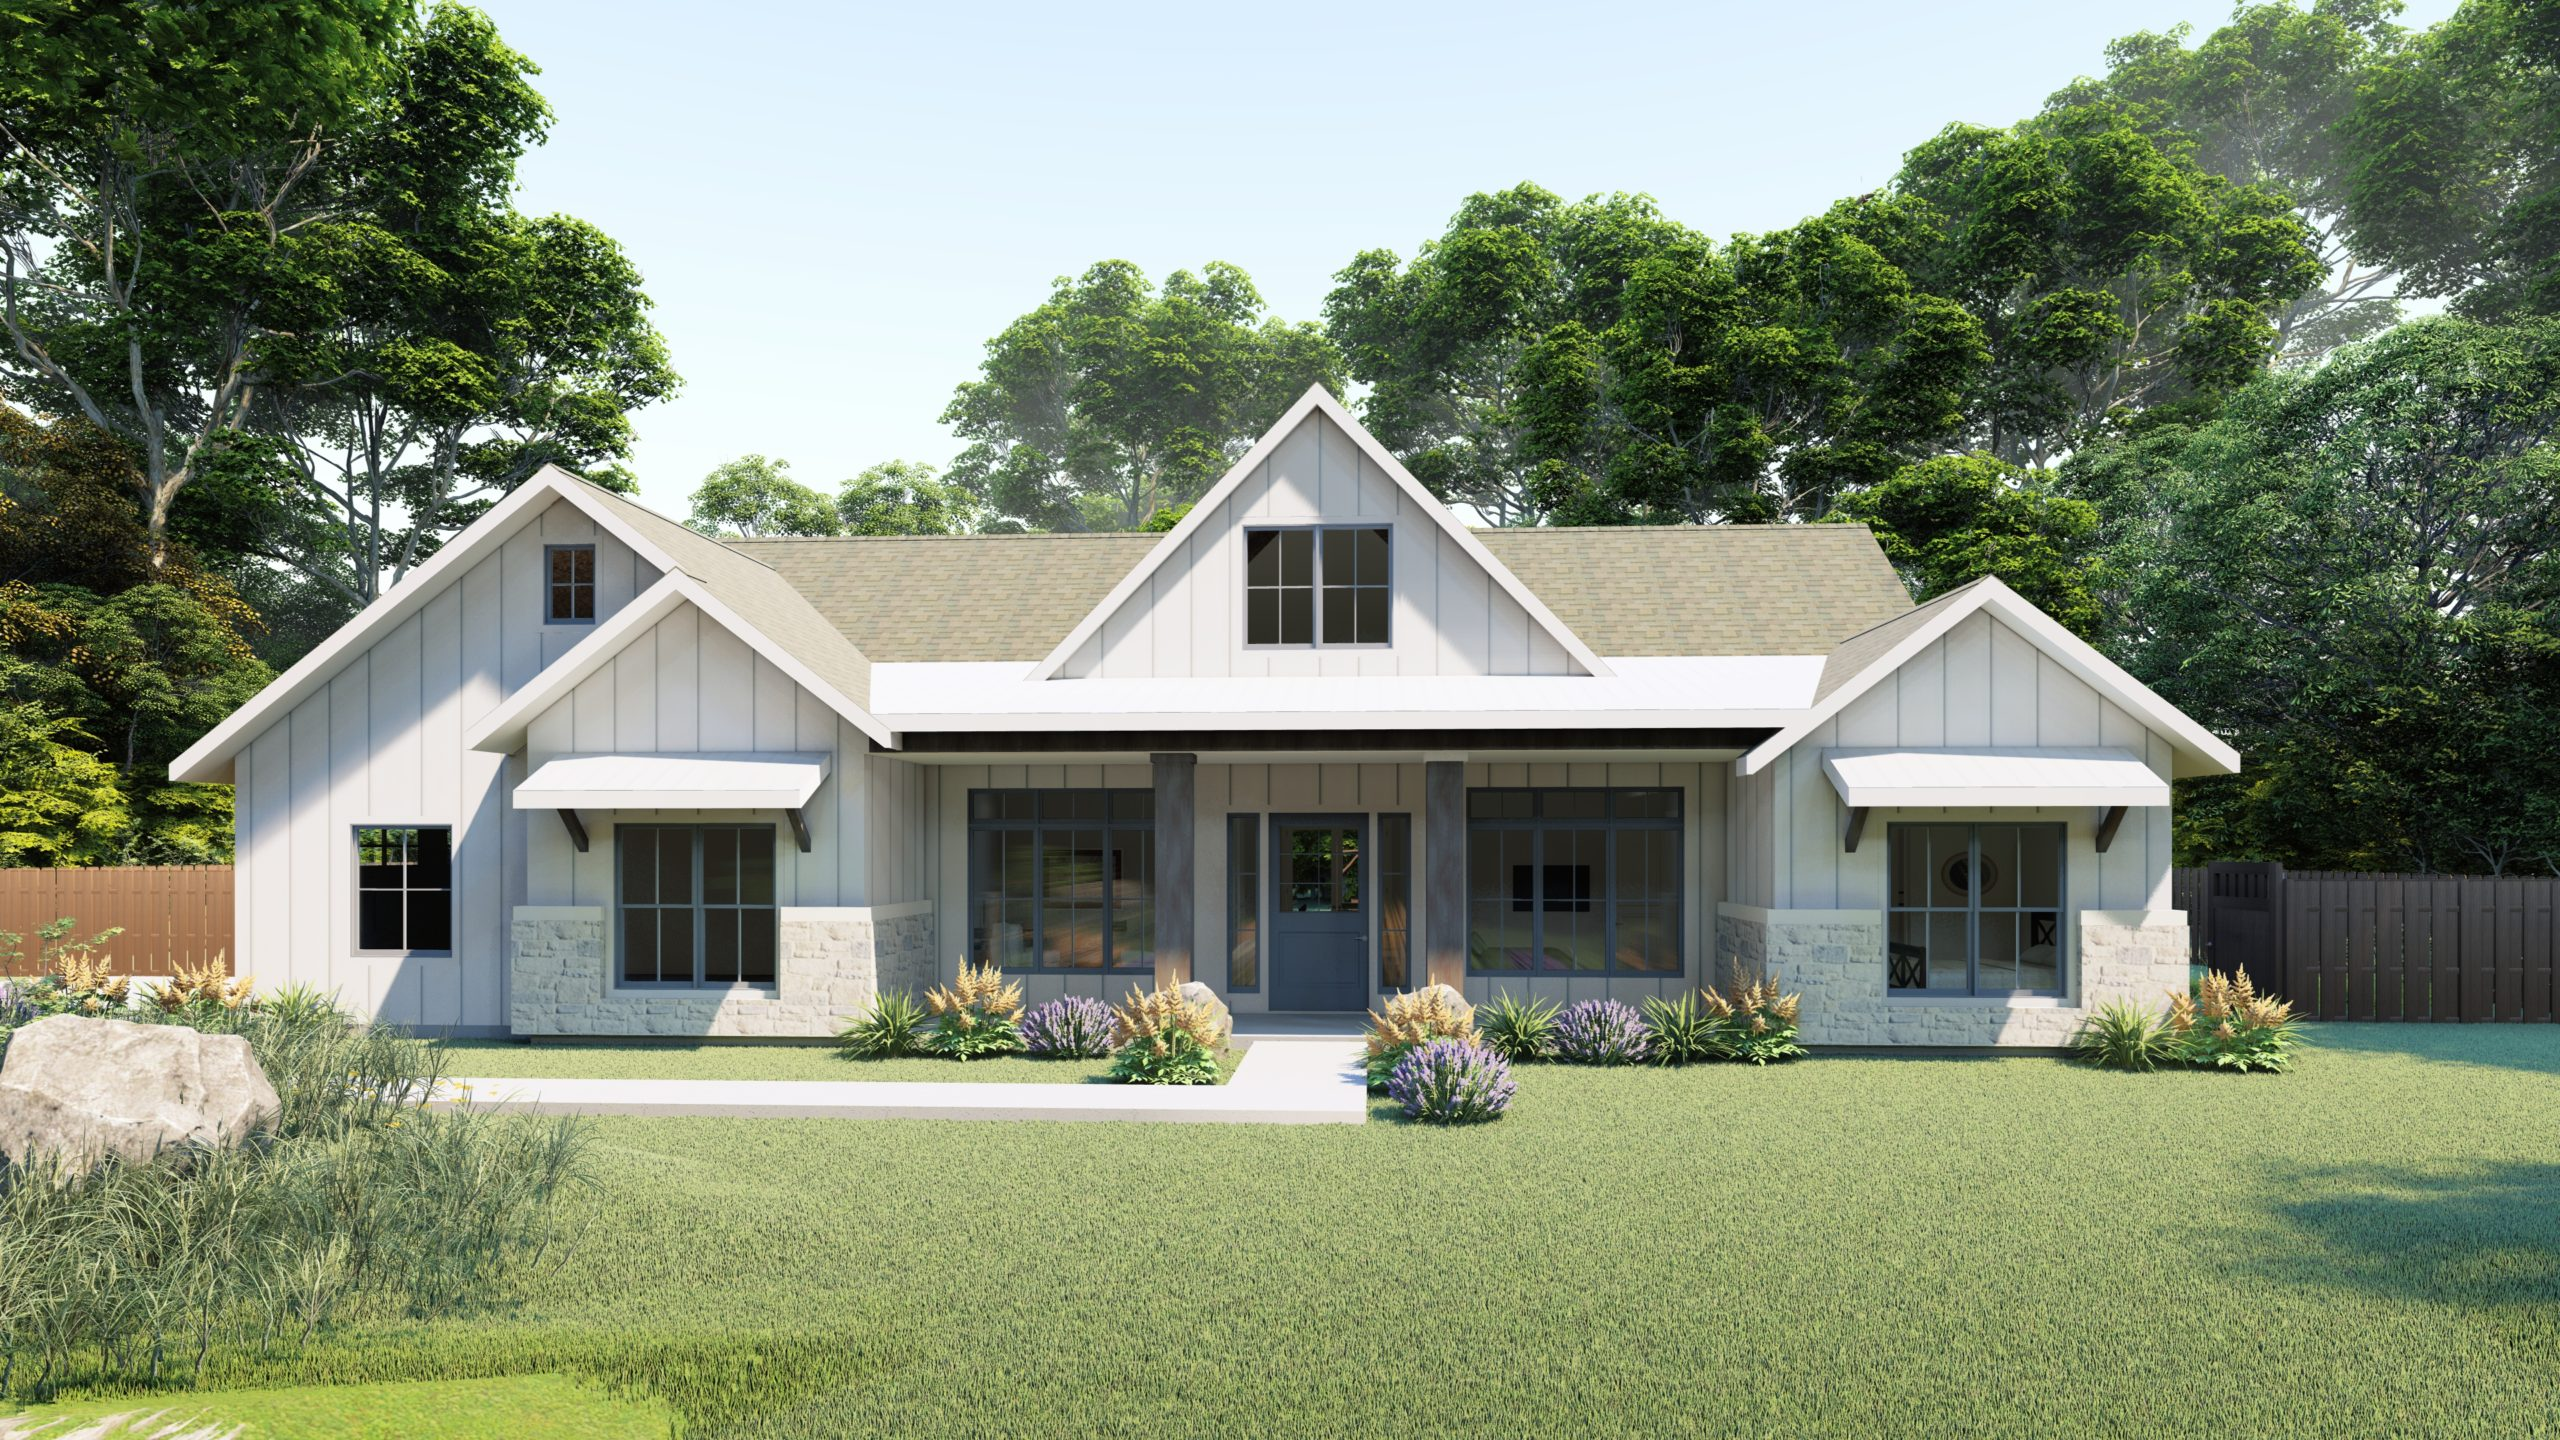 Modern Farmhouse Rendering